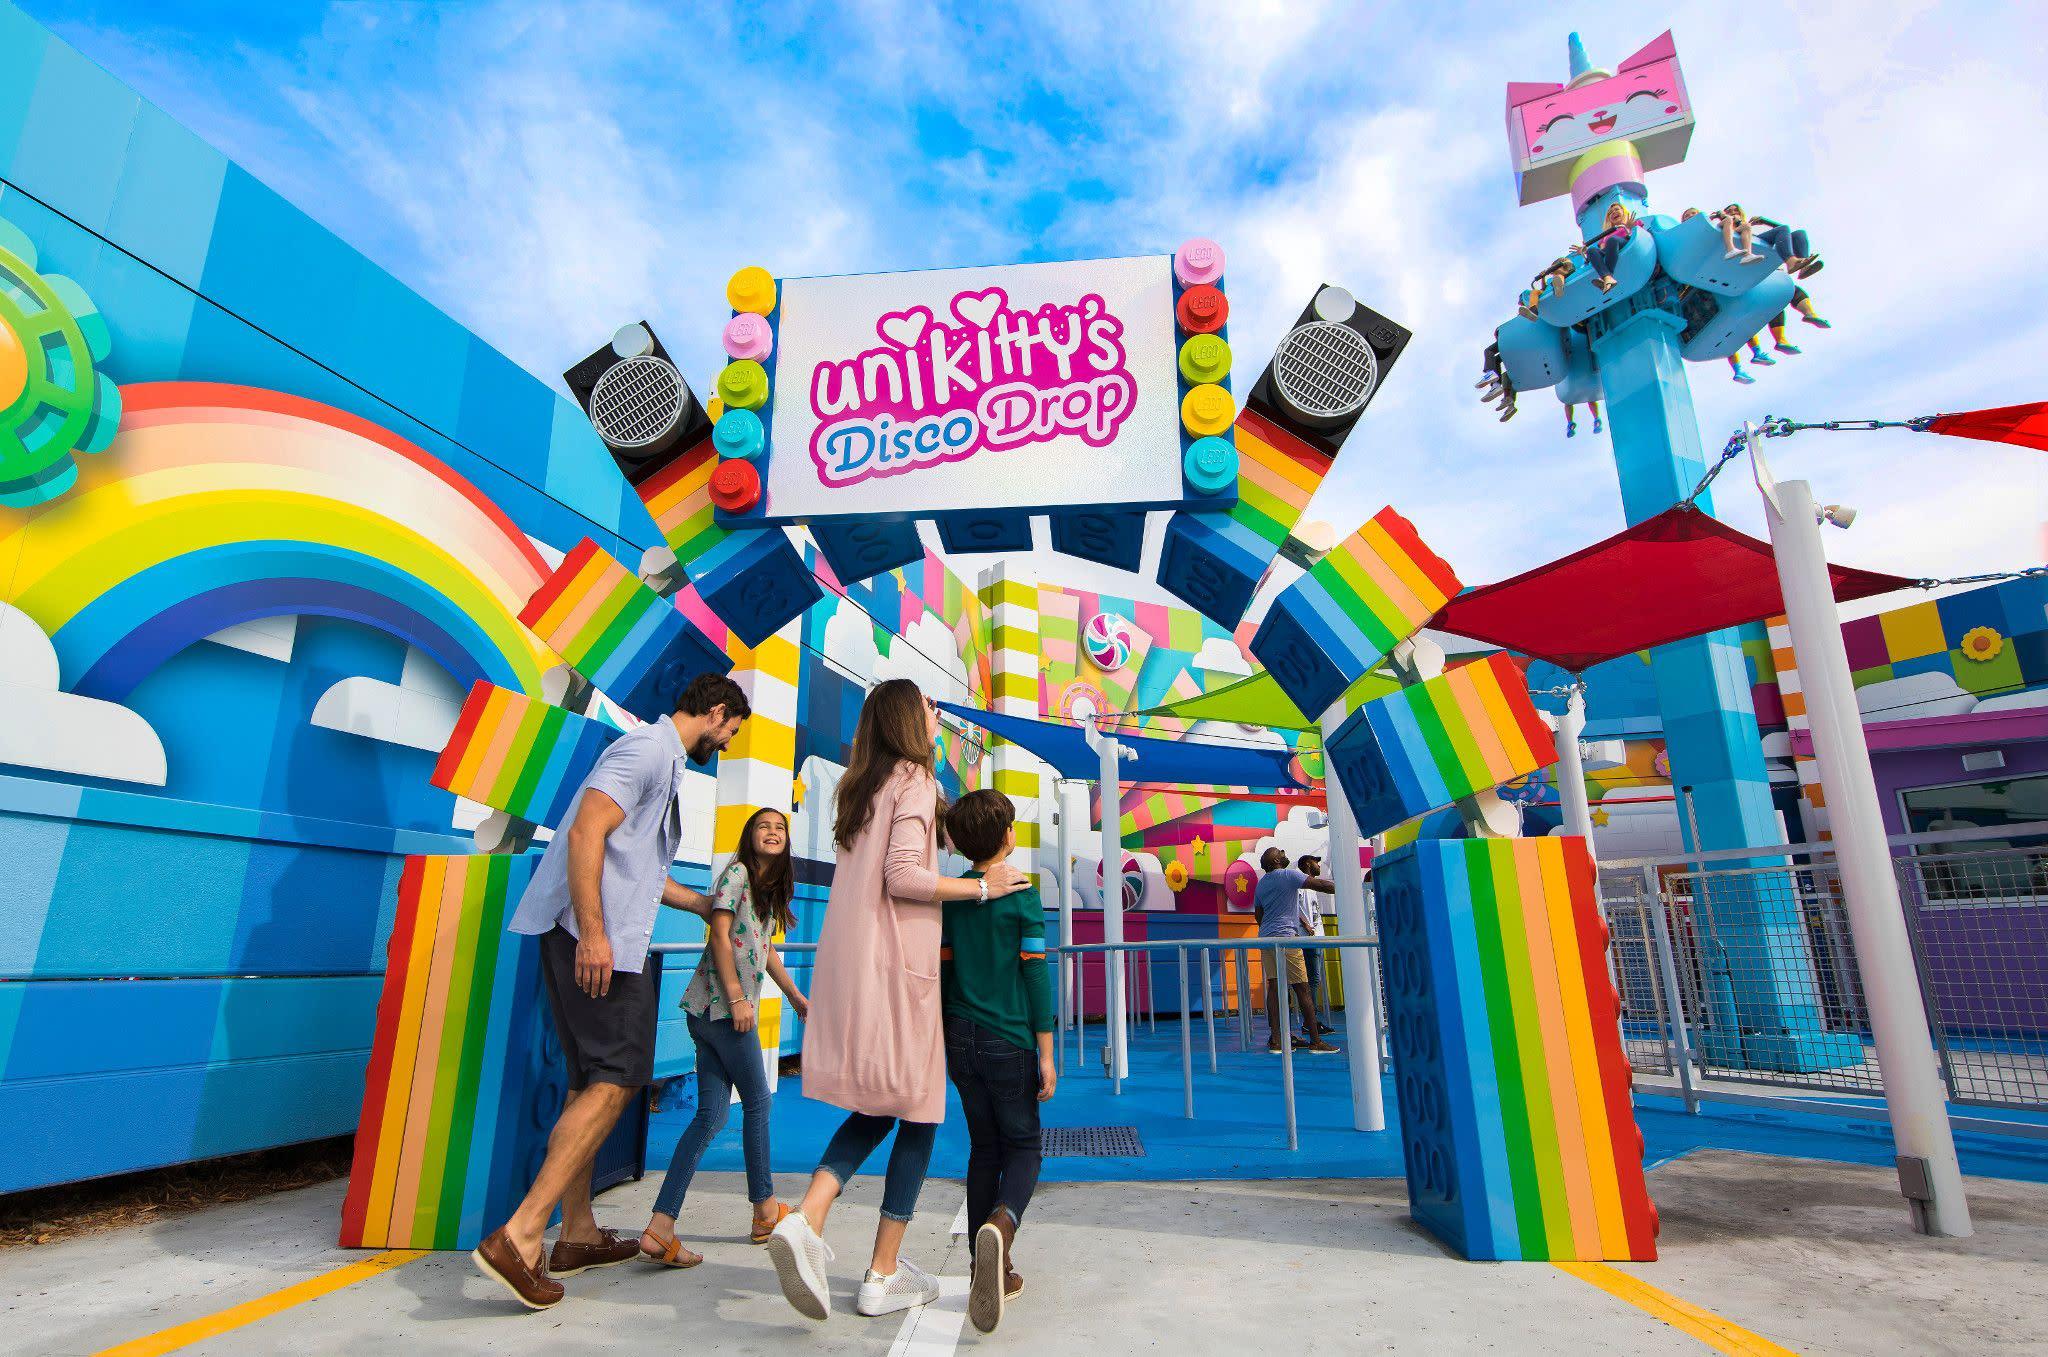 Unikitty's Disco Drop at LEGOLAND Florida Resort's THE LEGO MOVIE WORLD